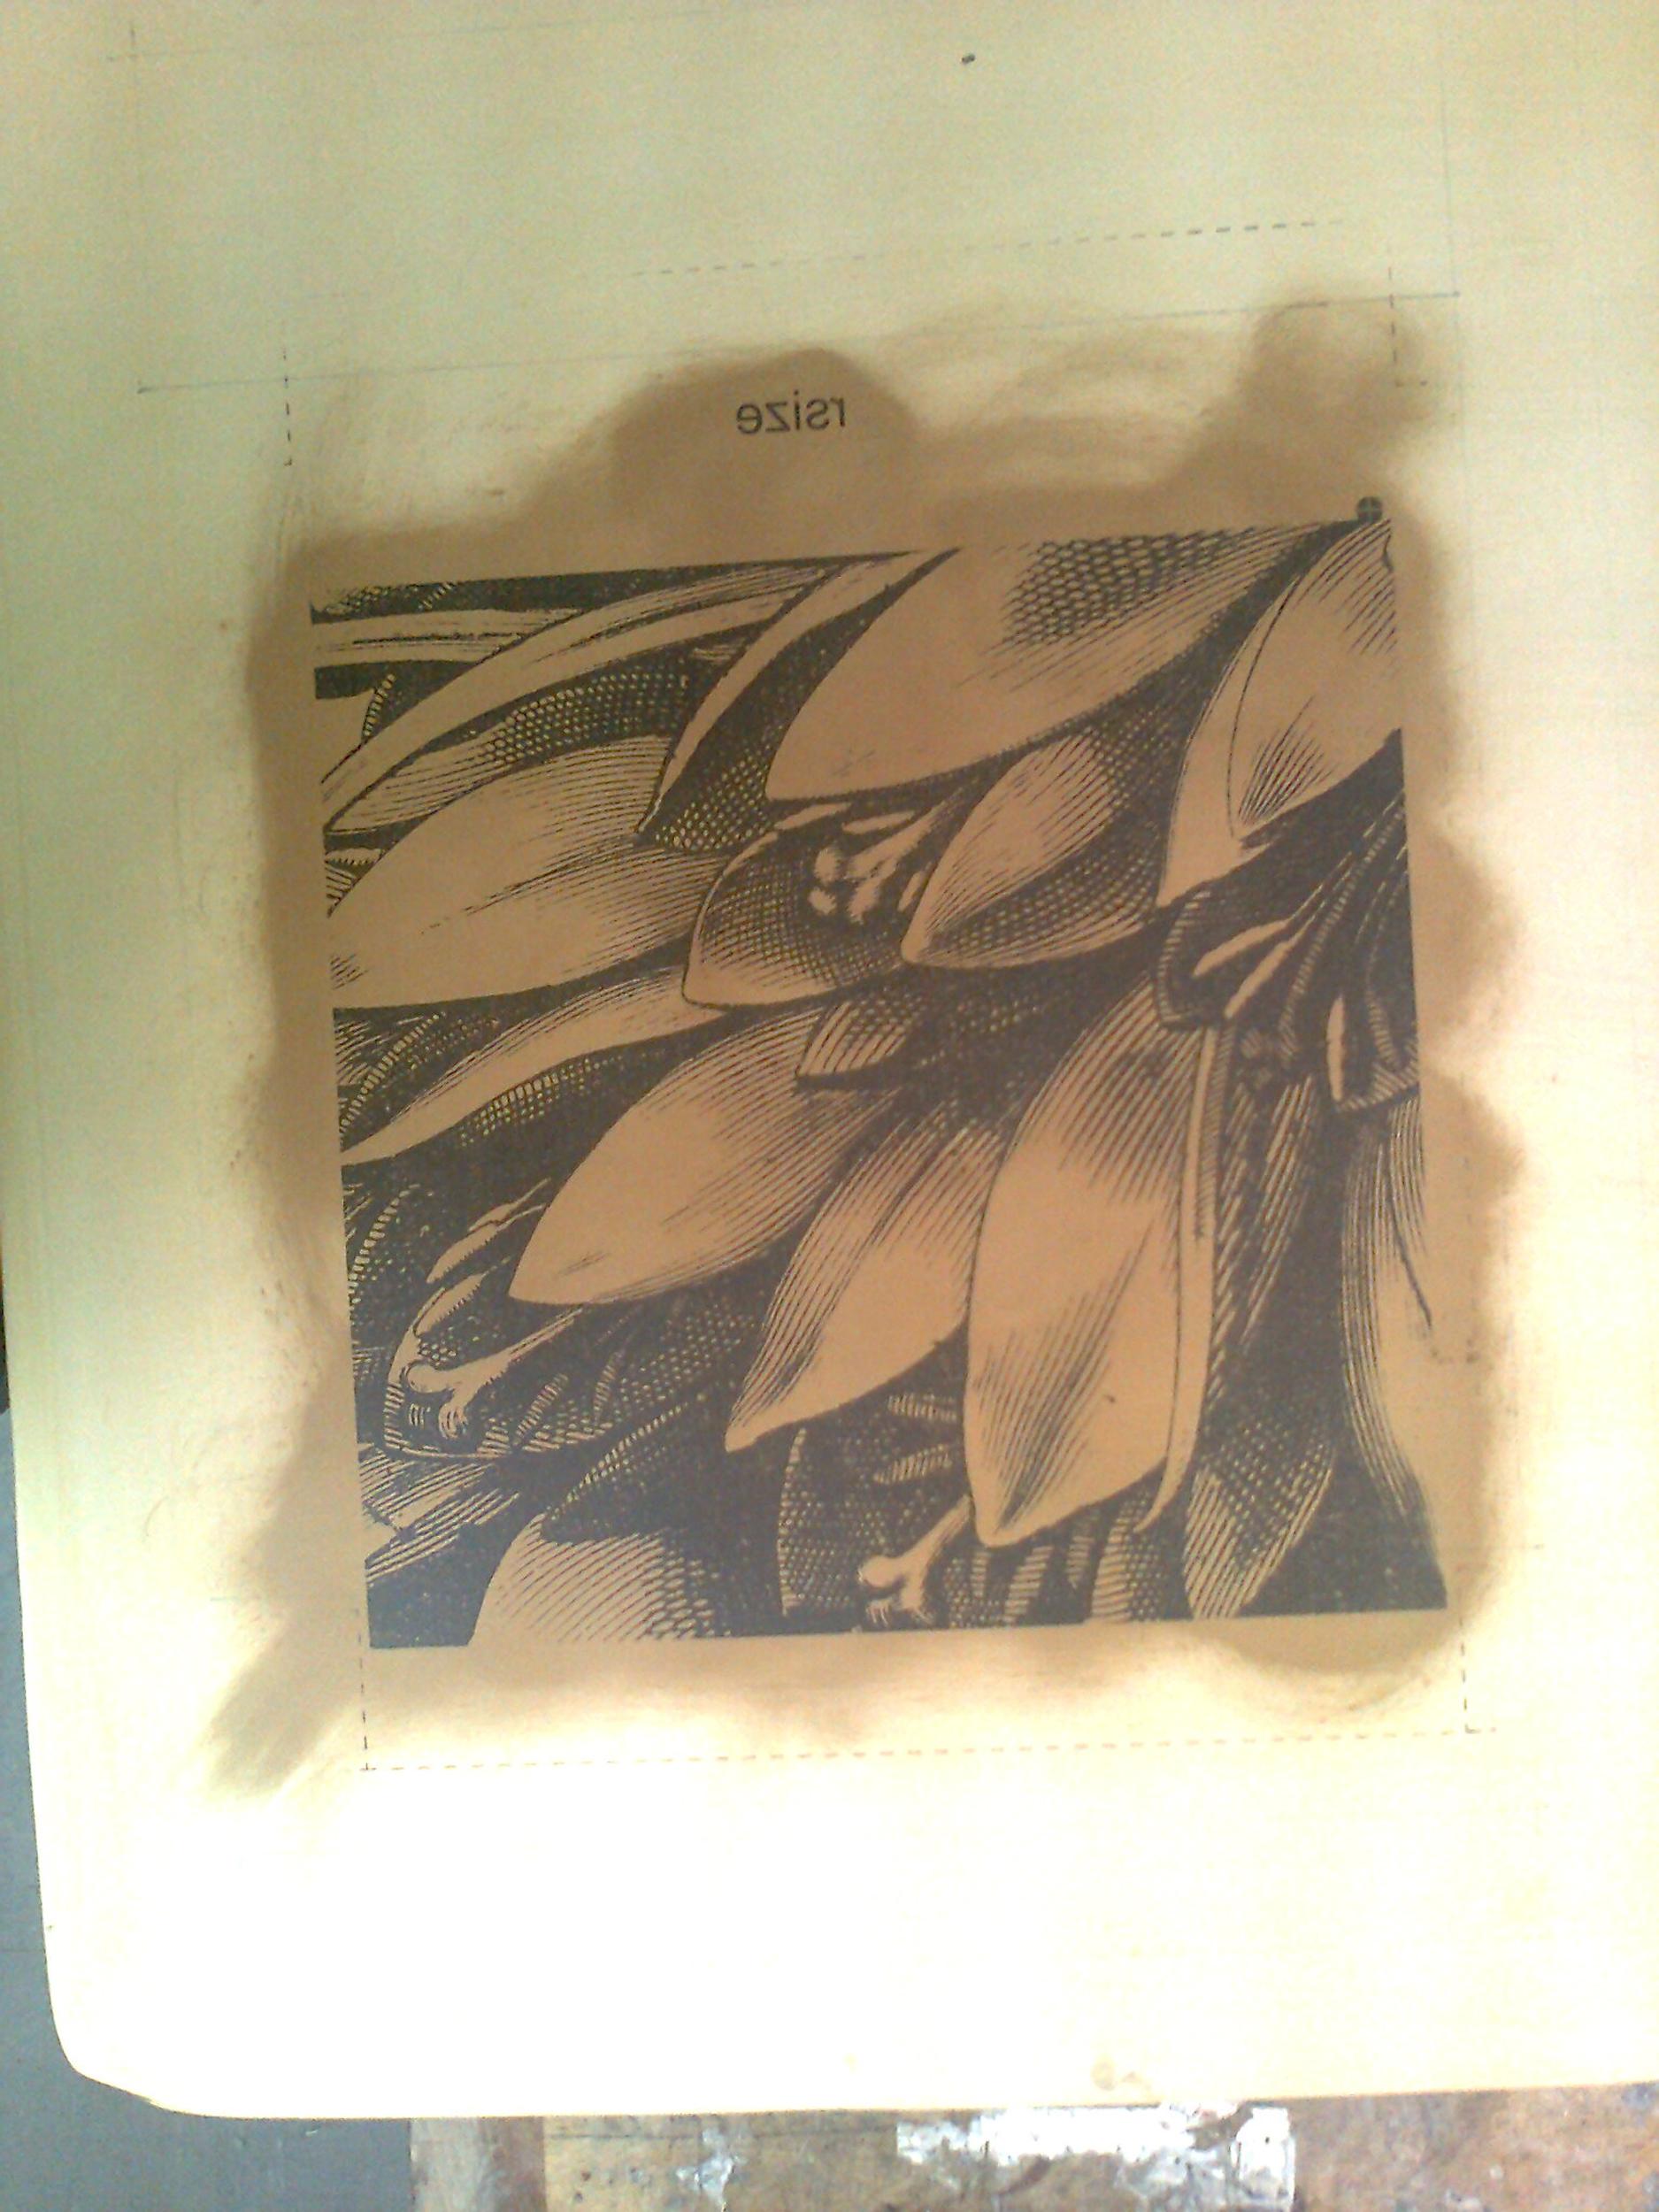 testimonial-i-iii-iii-progress-documentation-cellphone-sketchbook-010.jpg